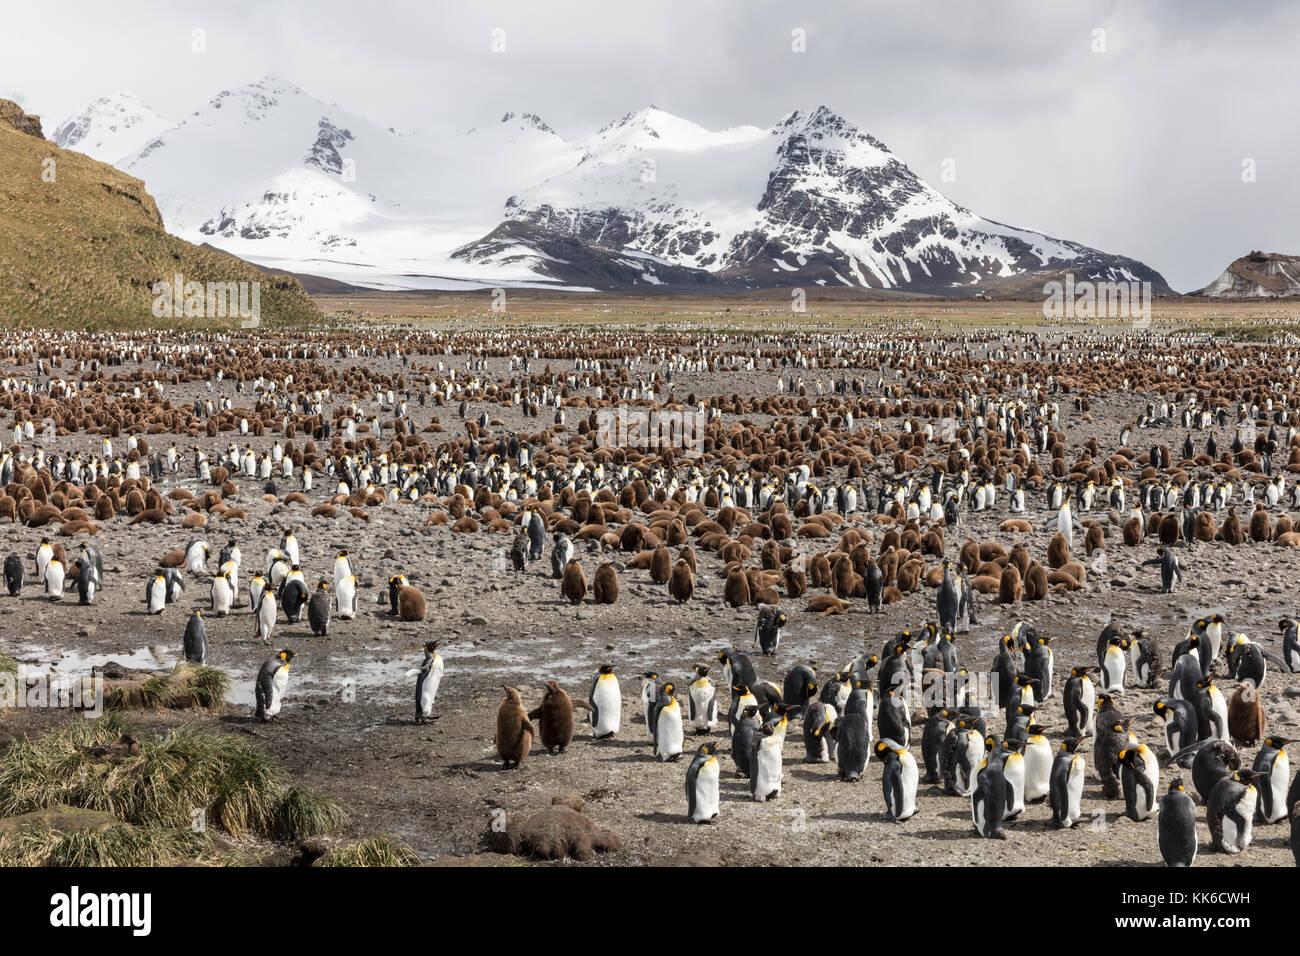 King penguin colony at Salisbury Plain, South Georgia Island Stock Photo